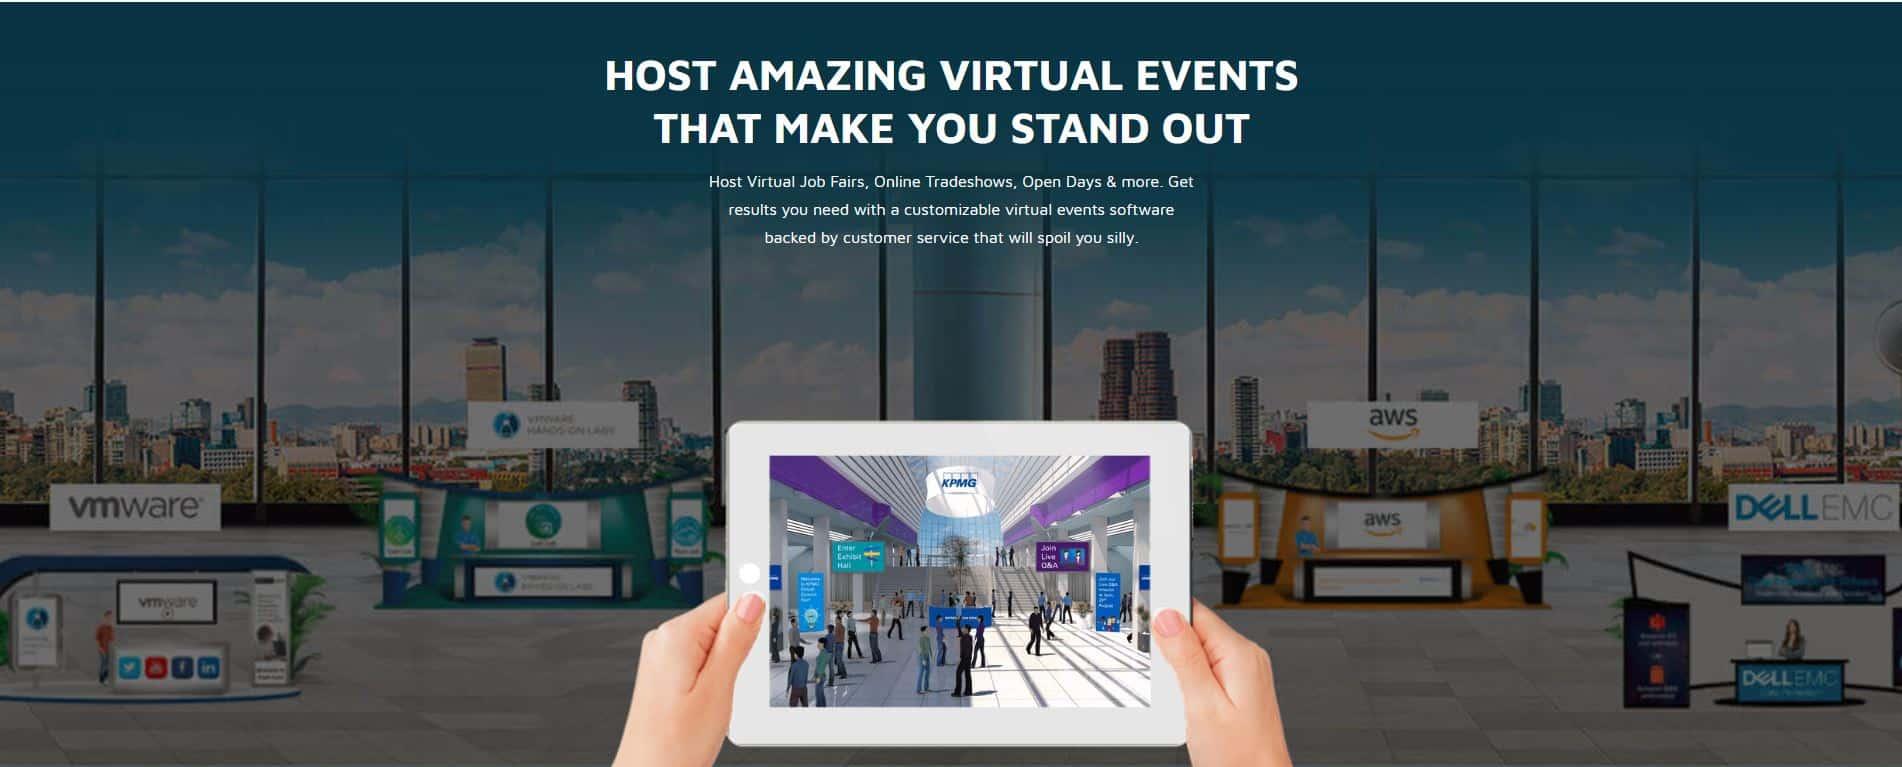 Virtual Events Platform Host Amazing Online Events Vfairs